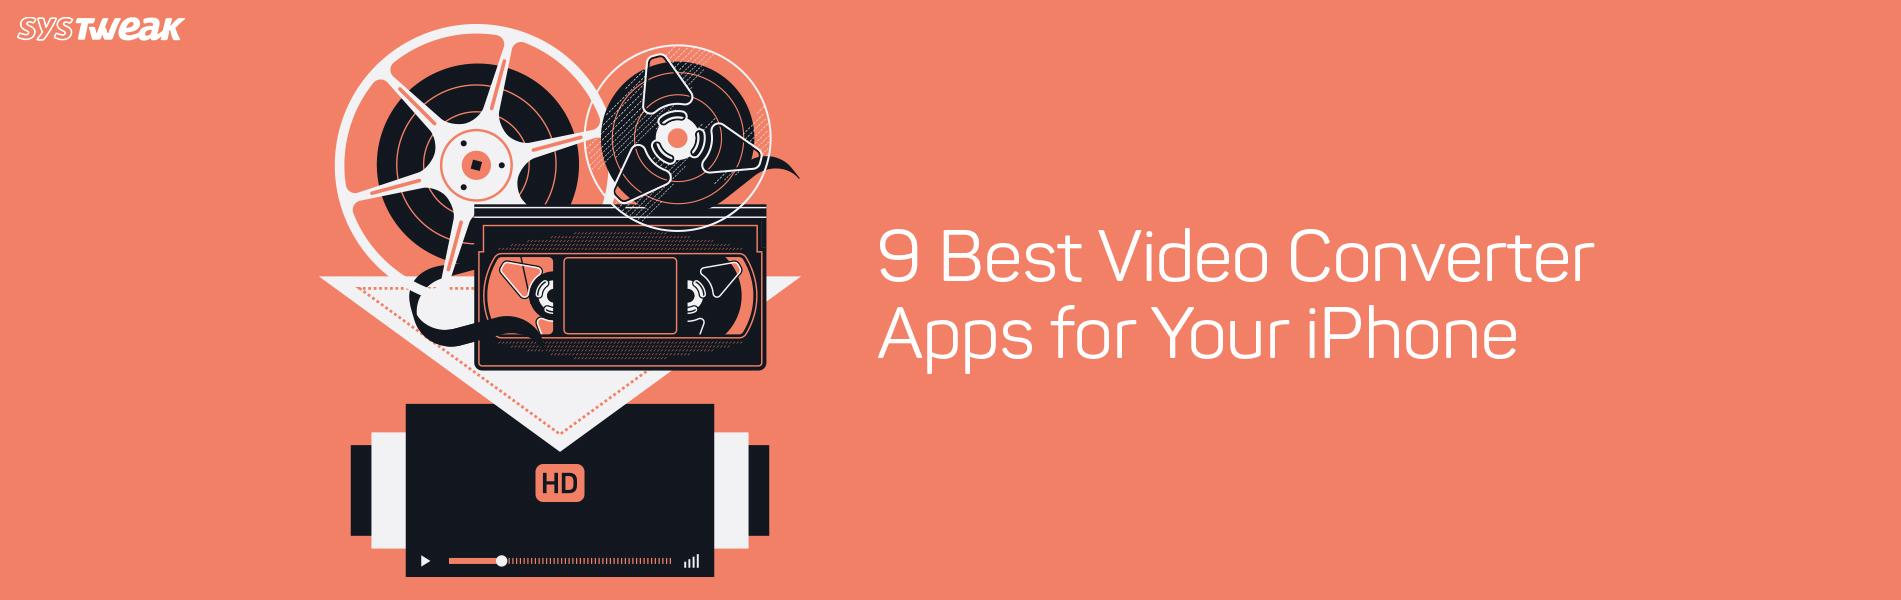 9 Best iPhone Video Converter Apps Of 2018